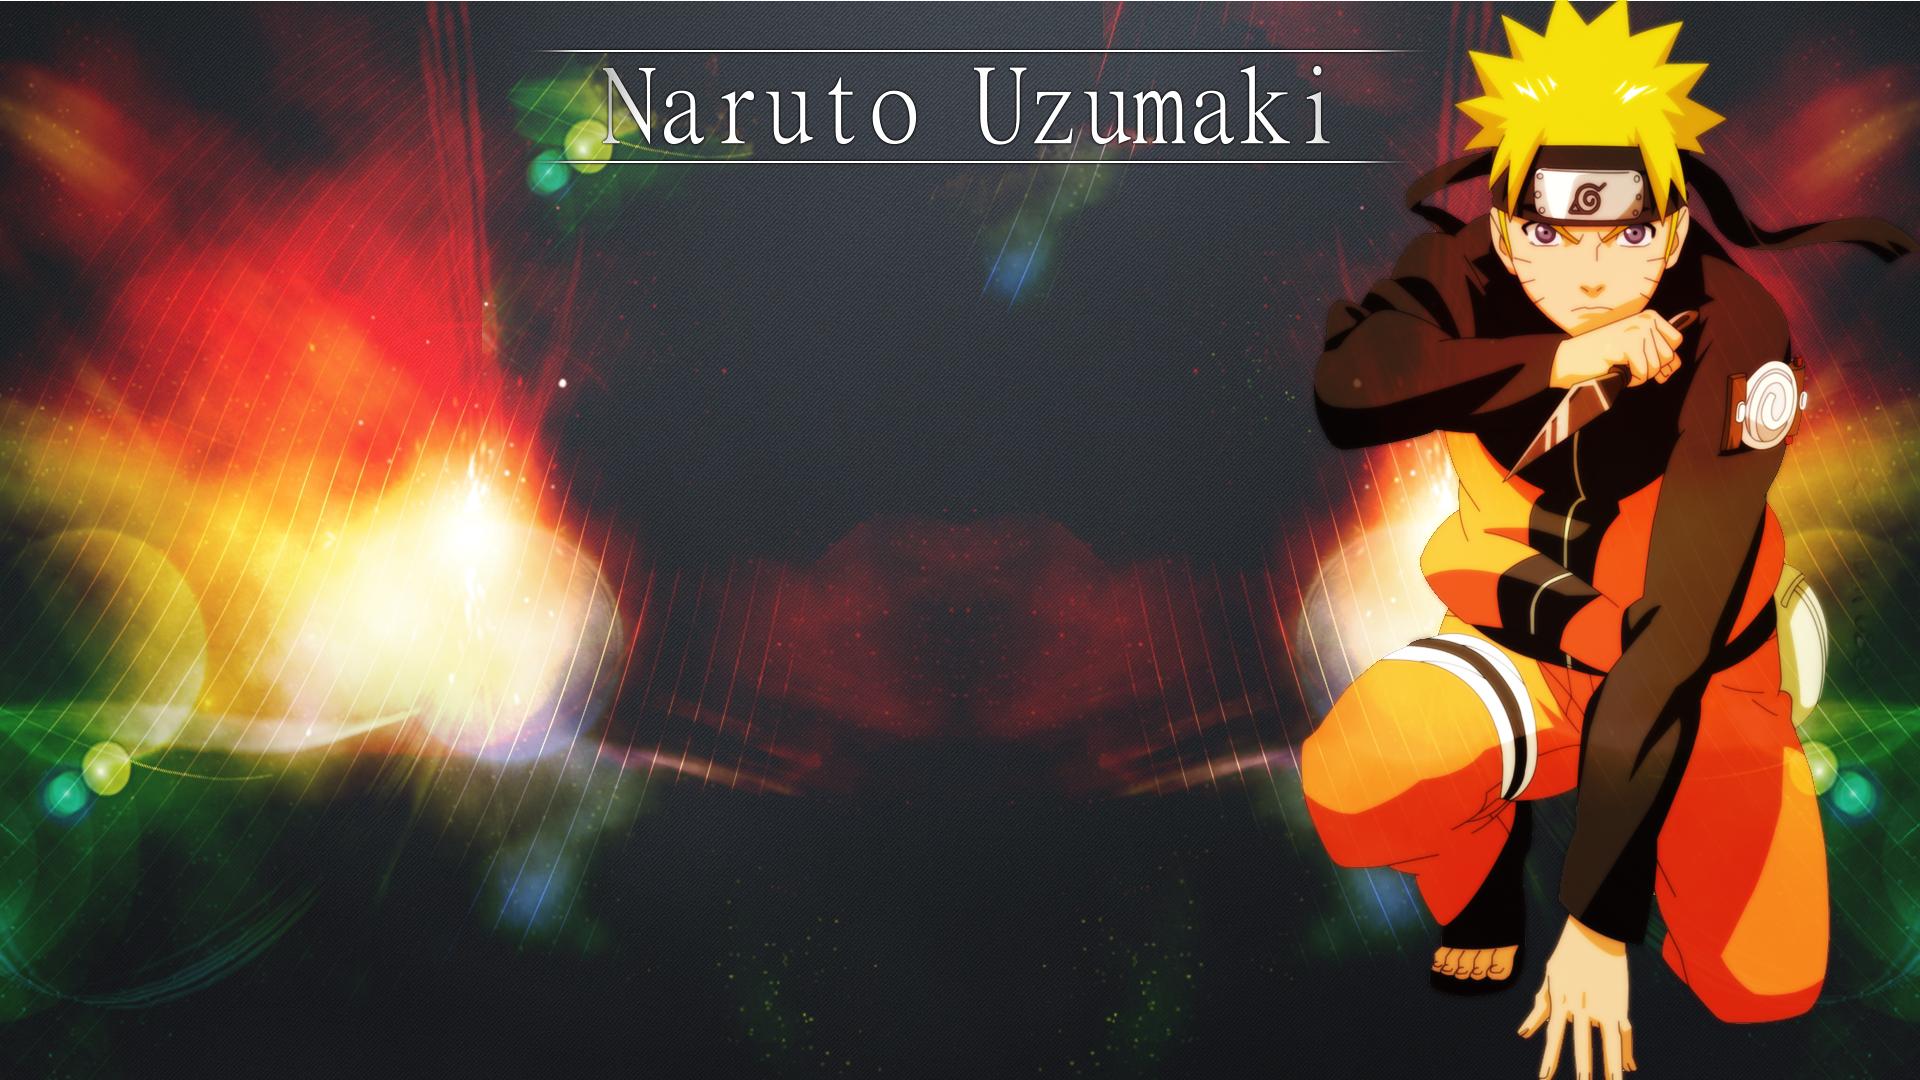 naruto uzumaki wallpaper nw - natalia wallpapers